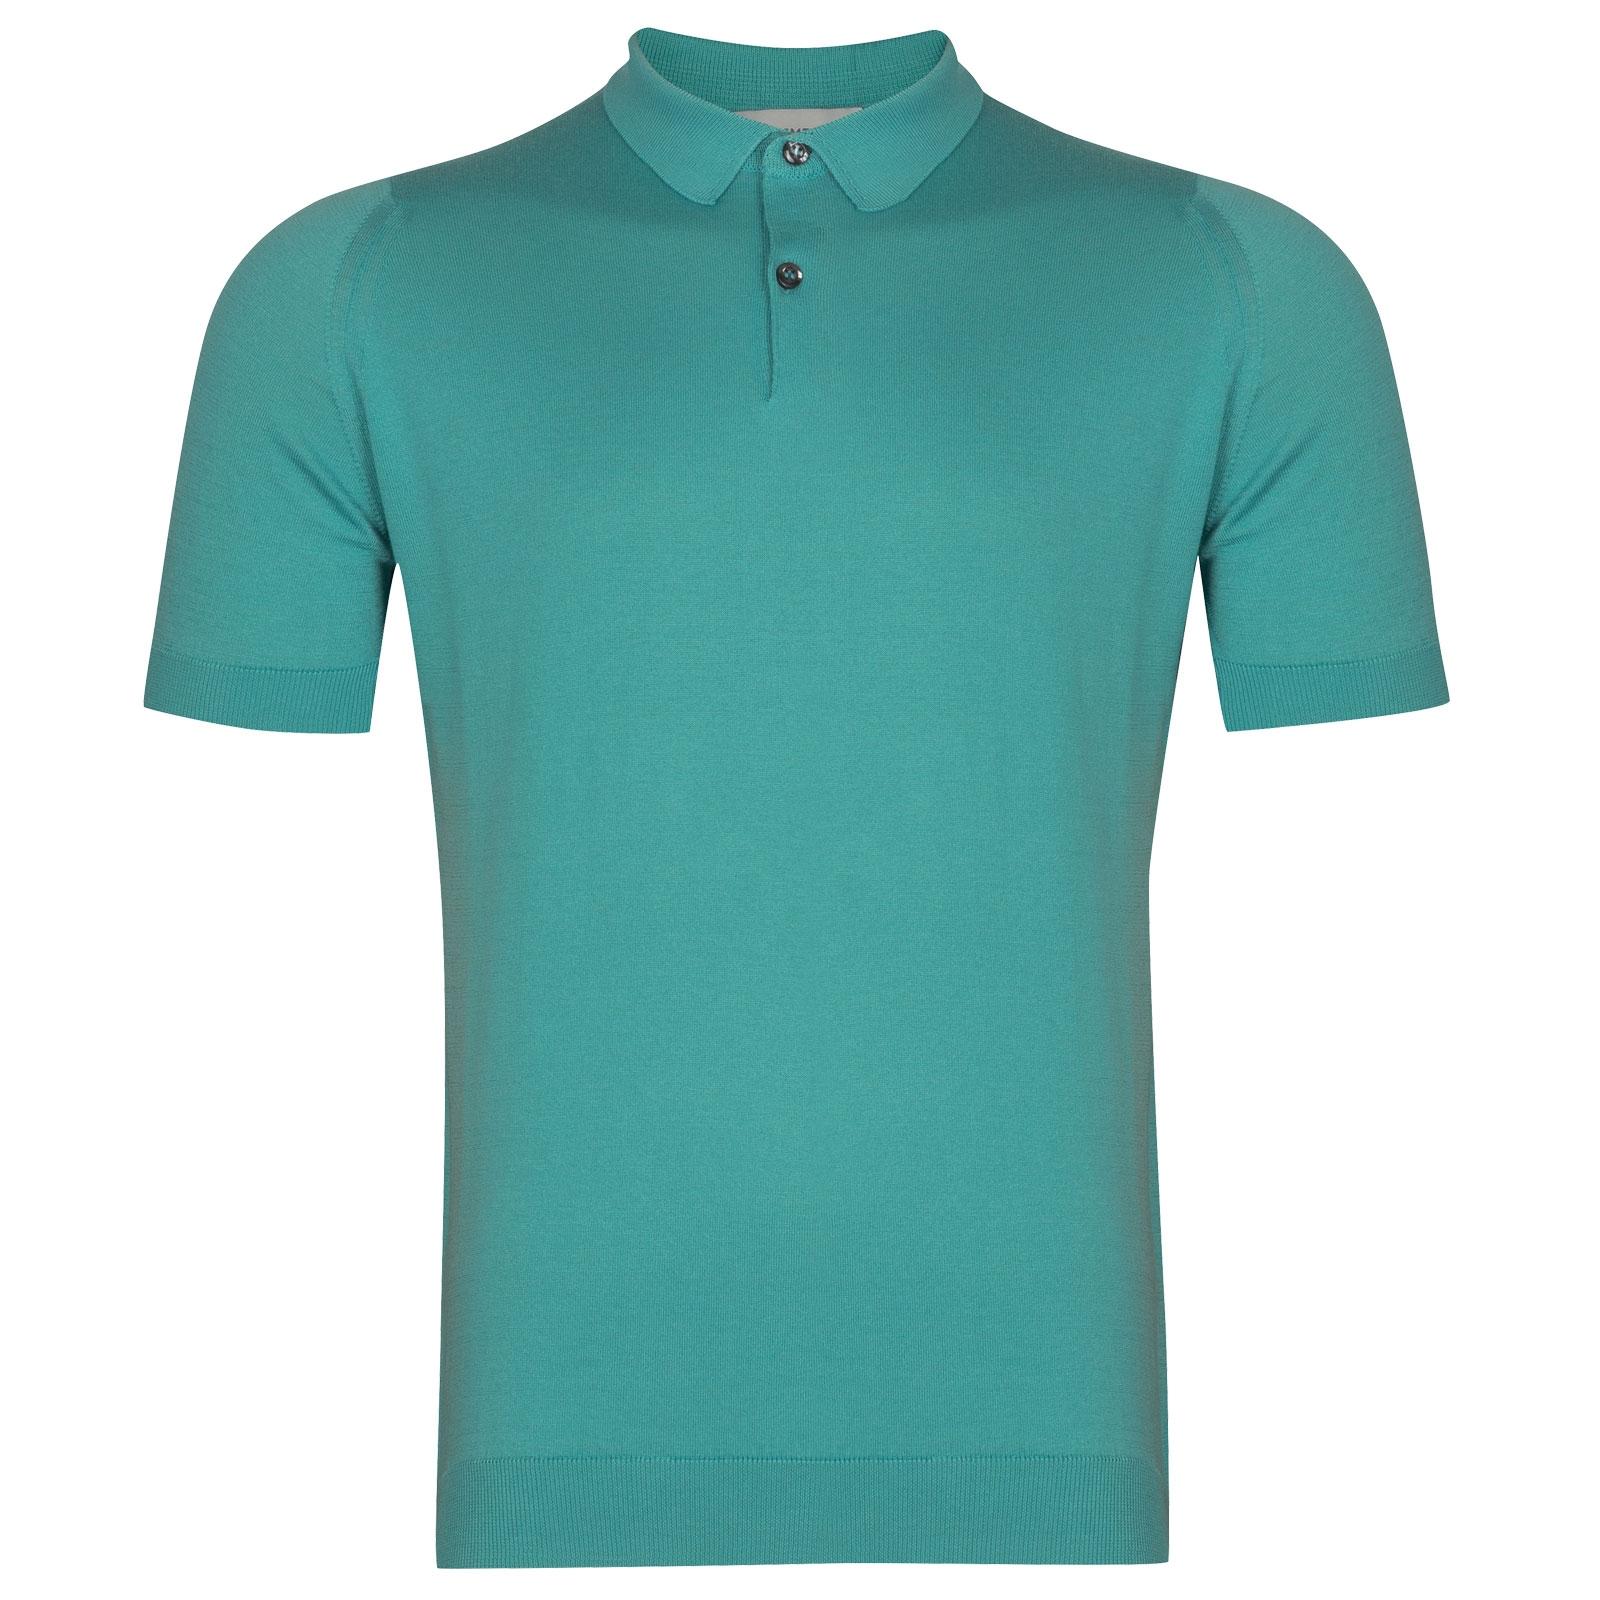 John Smedley Rhodes in Empyrean Blue Shirt-MED